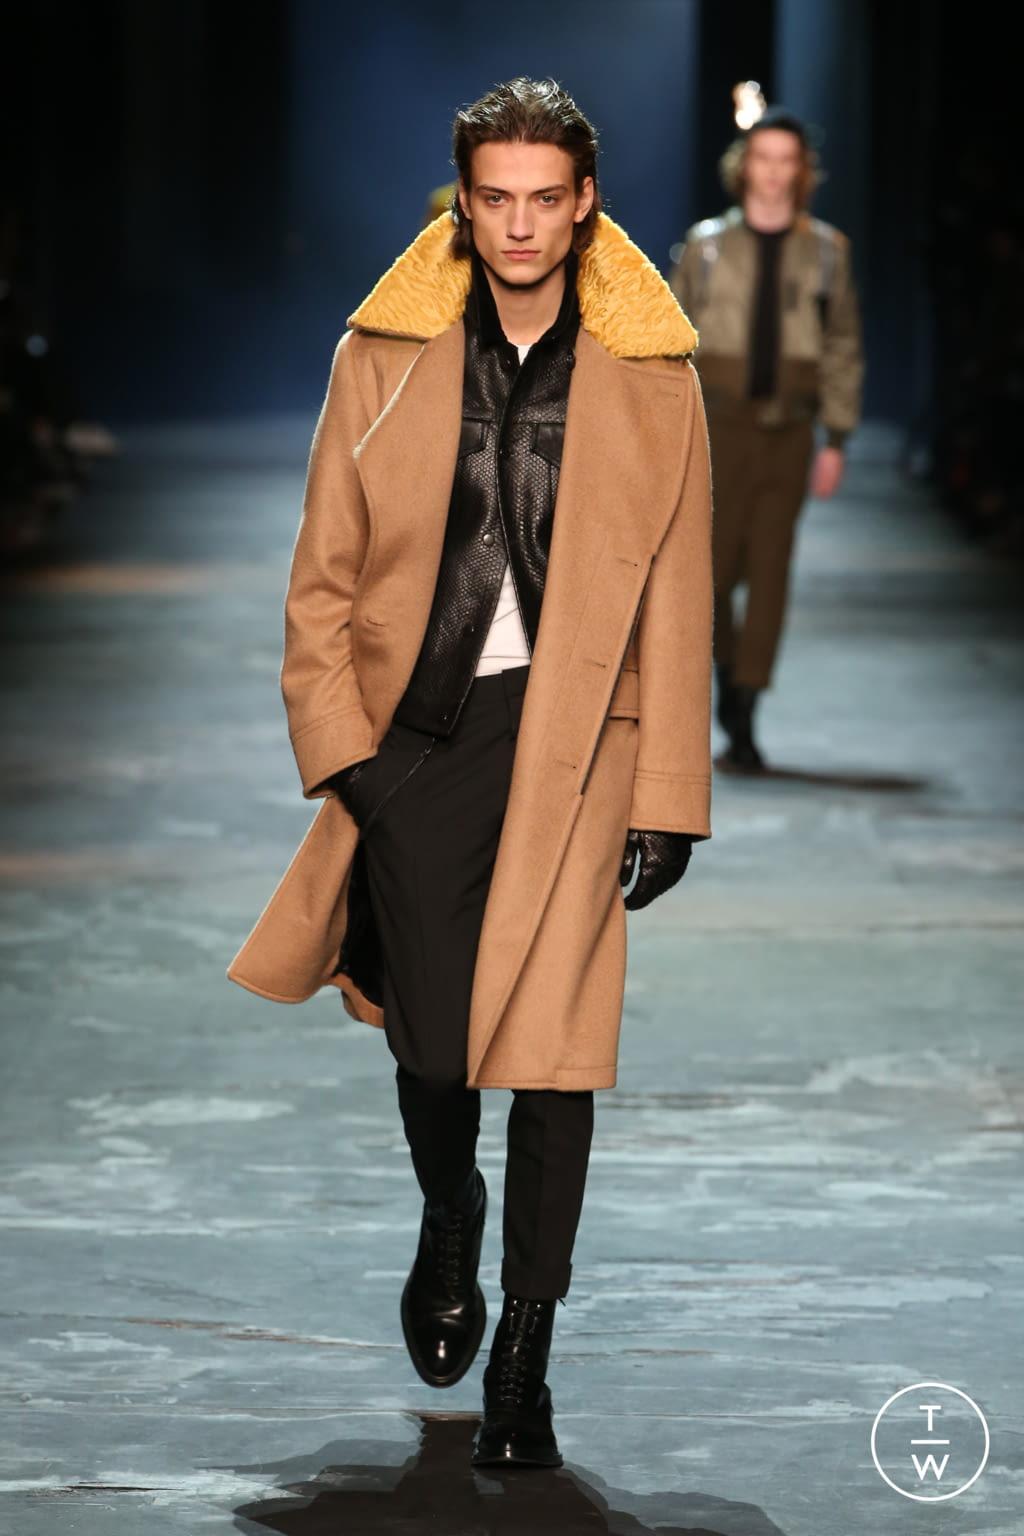 Fashion Week Paris Fall/Winter 2017 look 4 de la collection Berluti menswear